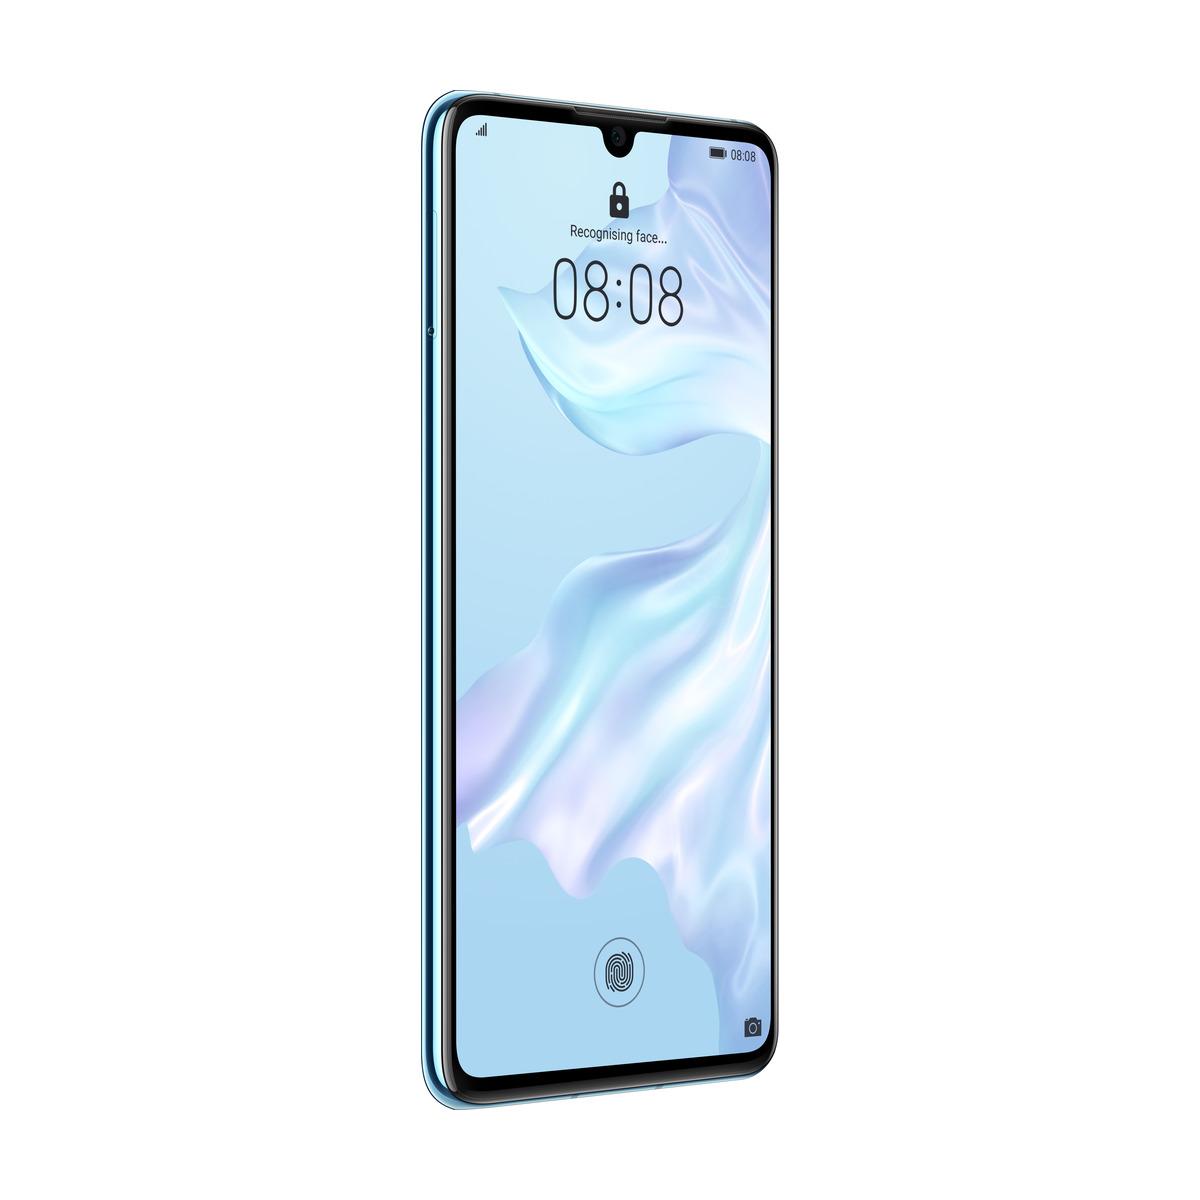 Huawei P30 Pro 128GB Breathing Crystal Mobiltelefoner